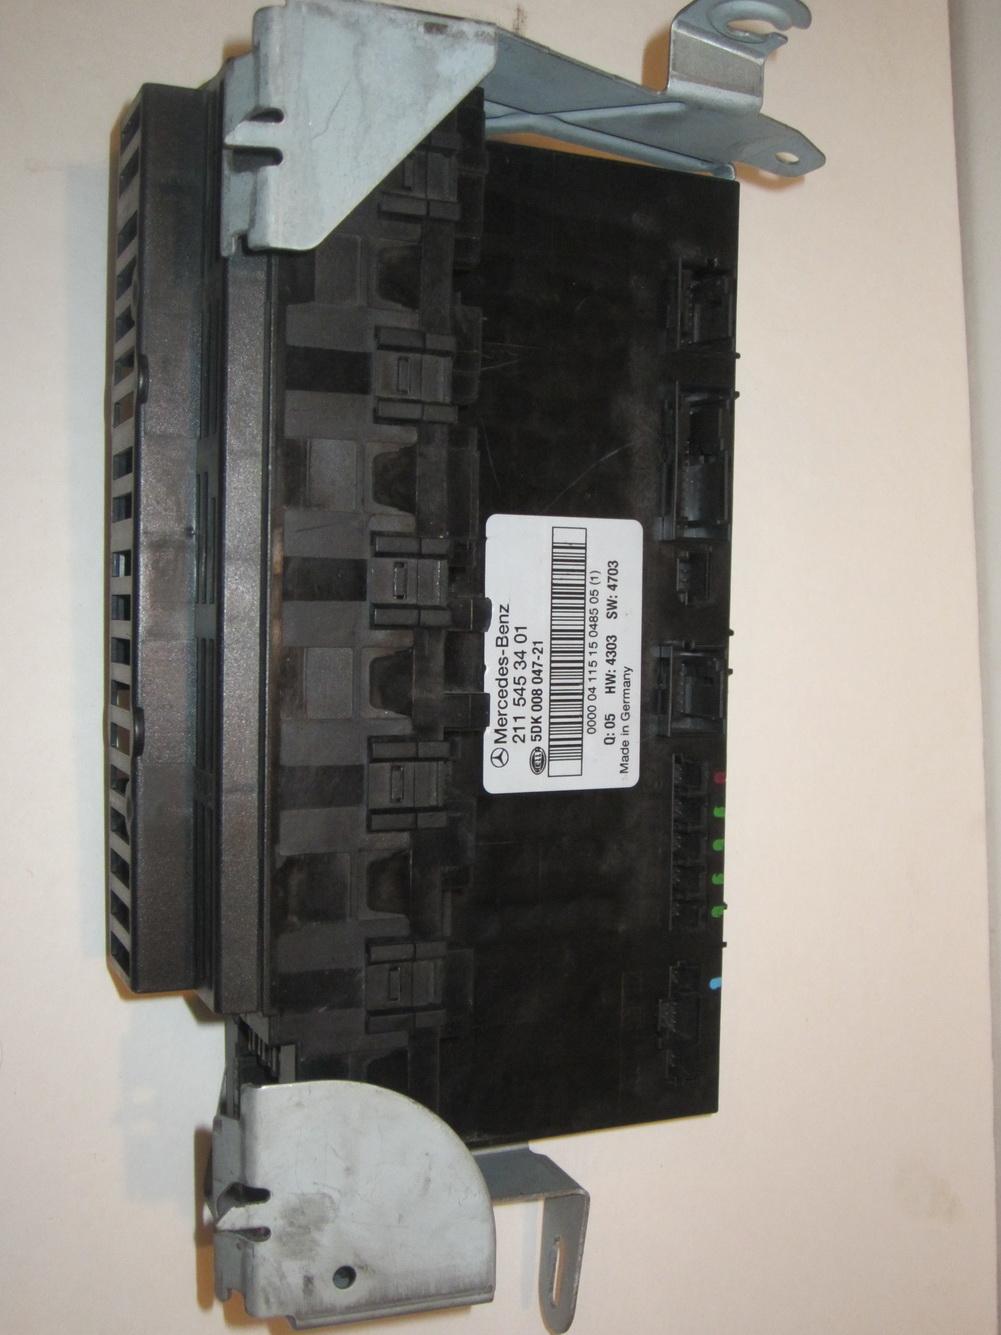 Mercedes Benz Sam Control Fuse Box 2115453401 Used Auto Parts Infiniti M37